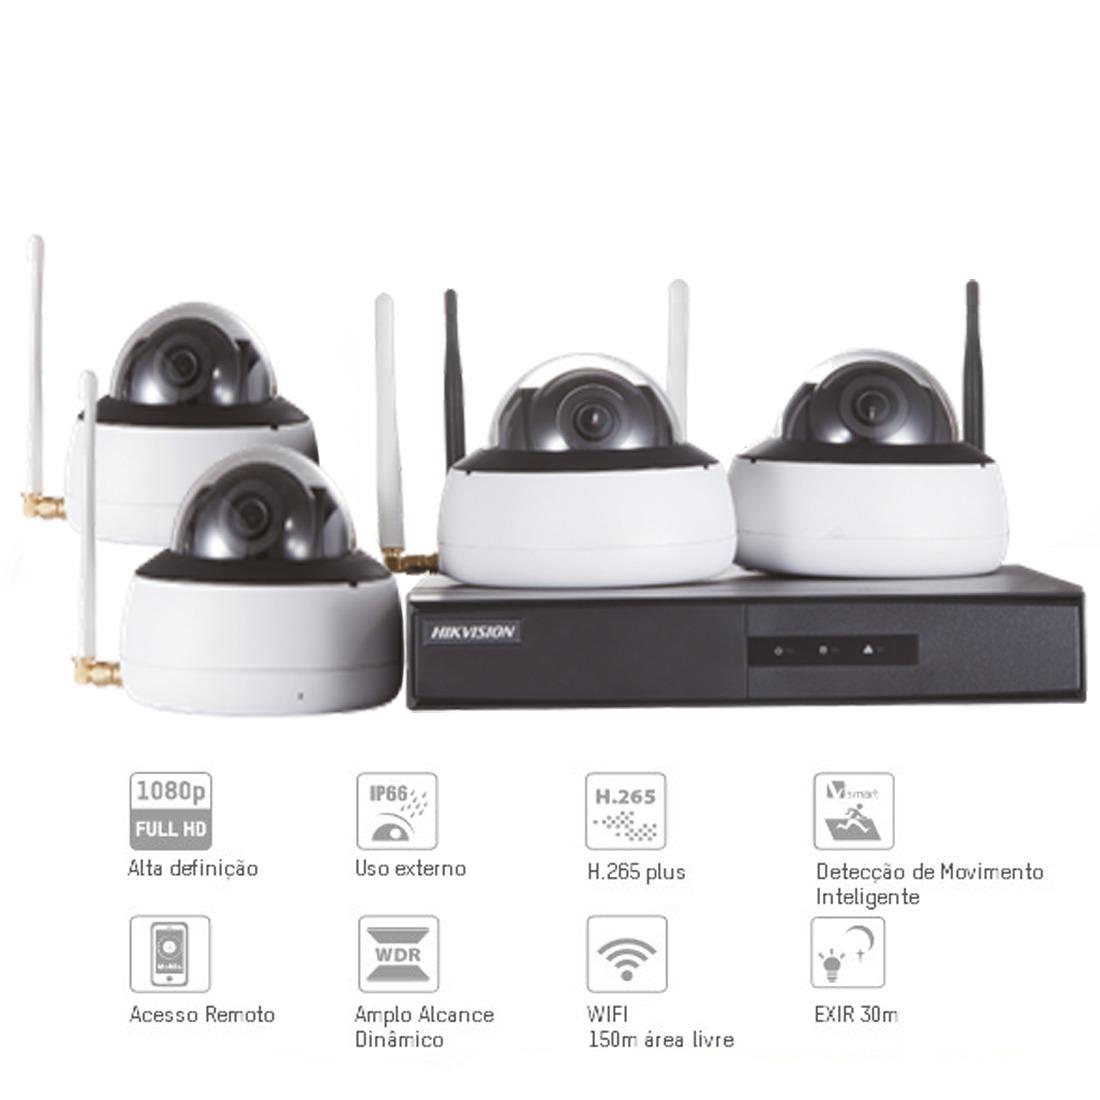 kit-de-monitoramento-wifi-nvr-04-cmeras-hikvision-nk4w1-D_NQ_NP_891611-MLB27985241266_082018-F